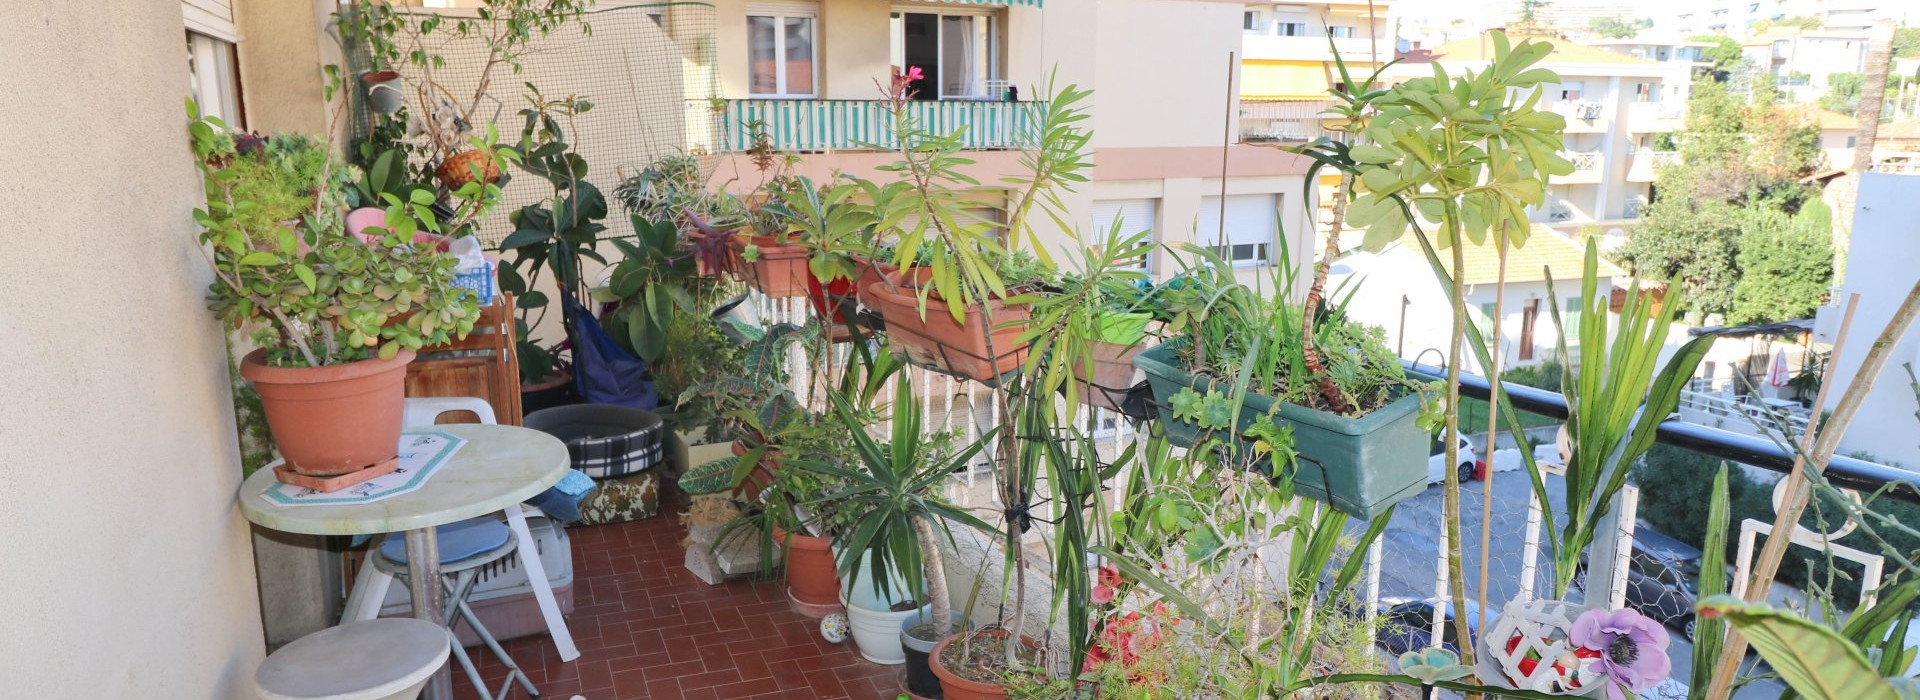 Appartement Nice 1 Pièce 33m2 115,000€